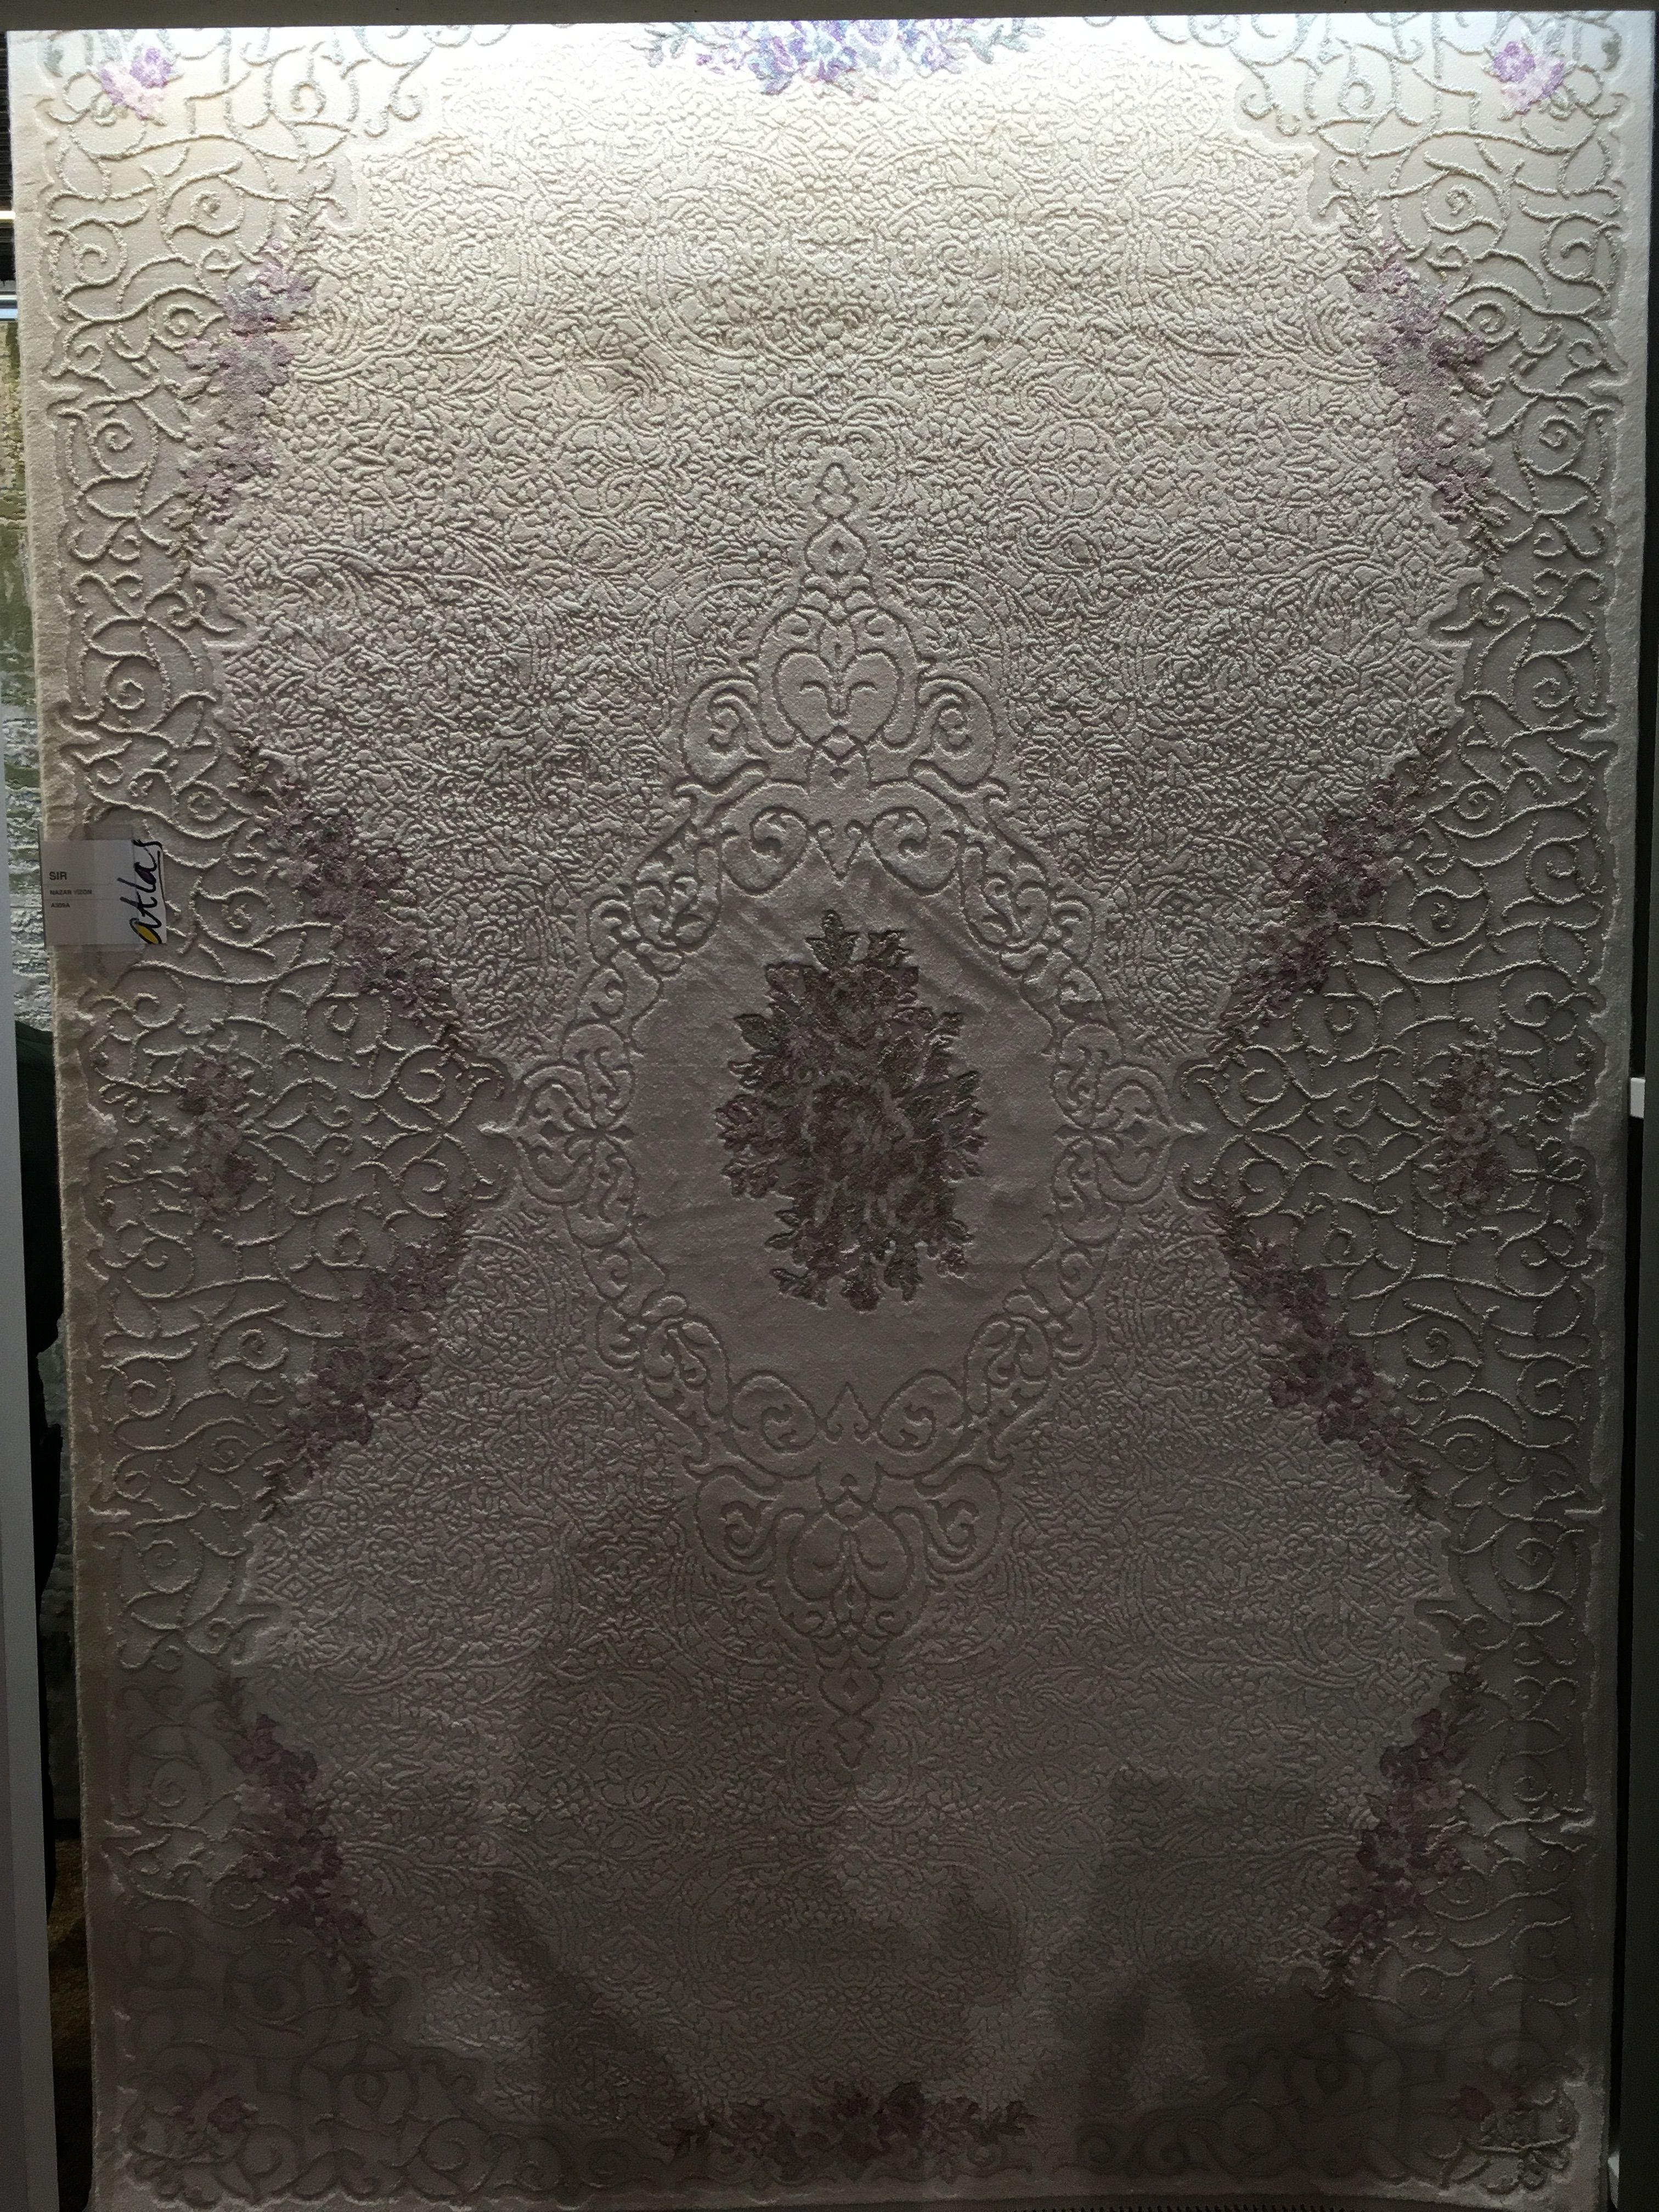 Turkmenoglu Alisveris Merkezi Adli Kullanicinin Turkmenoglu Hali Carpet Store Panosundaki Pin